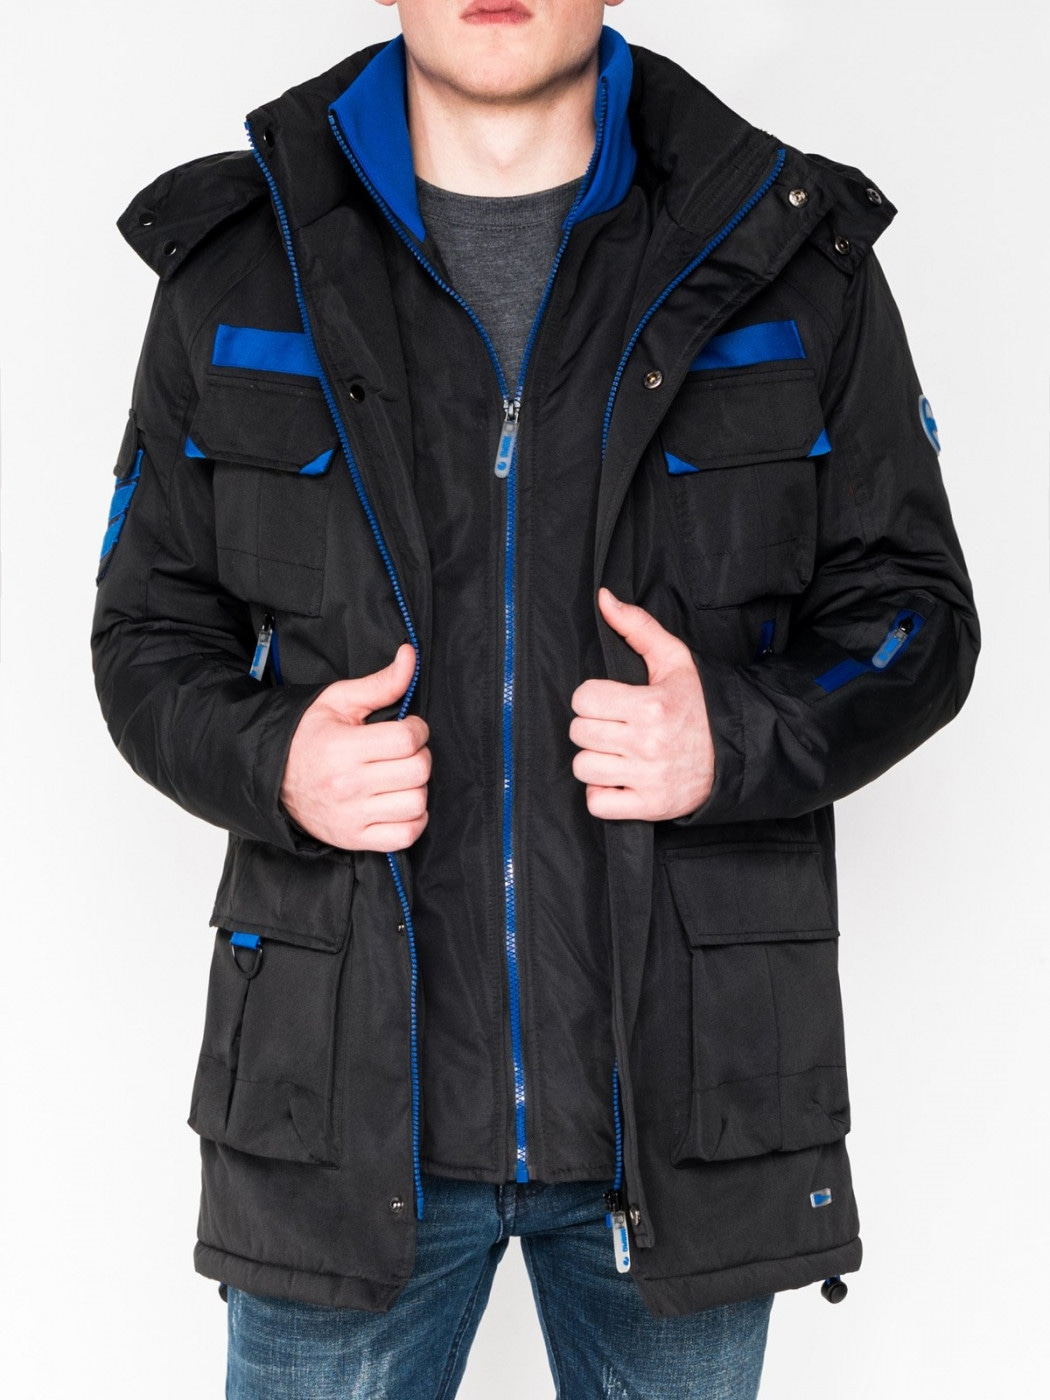 Ombre Clothing Men's winter jacket C379